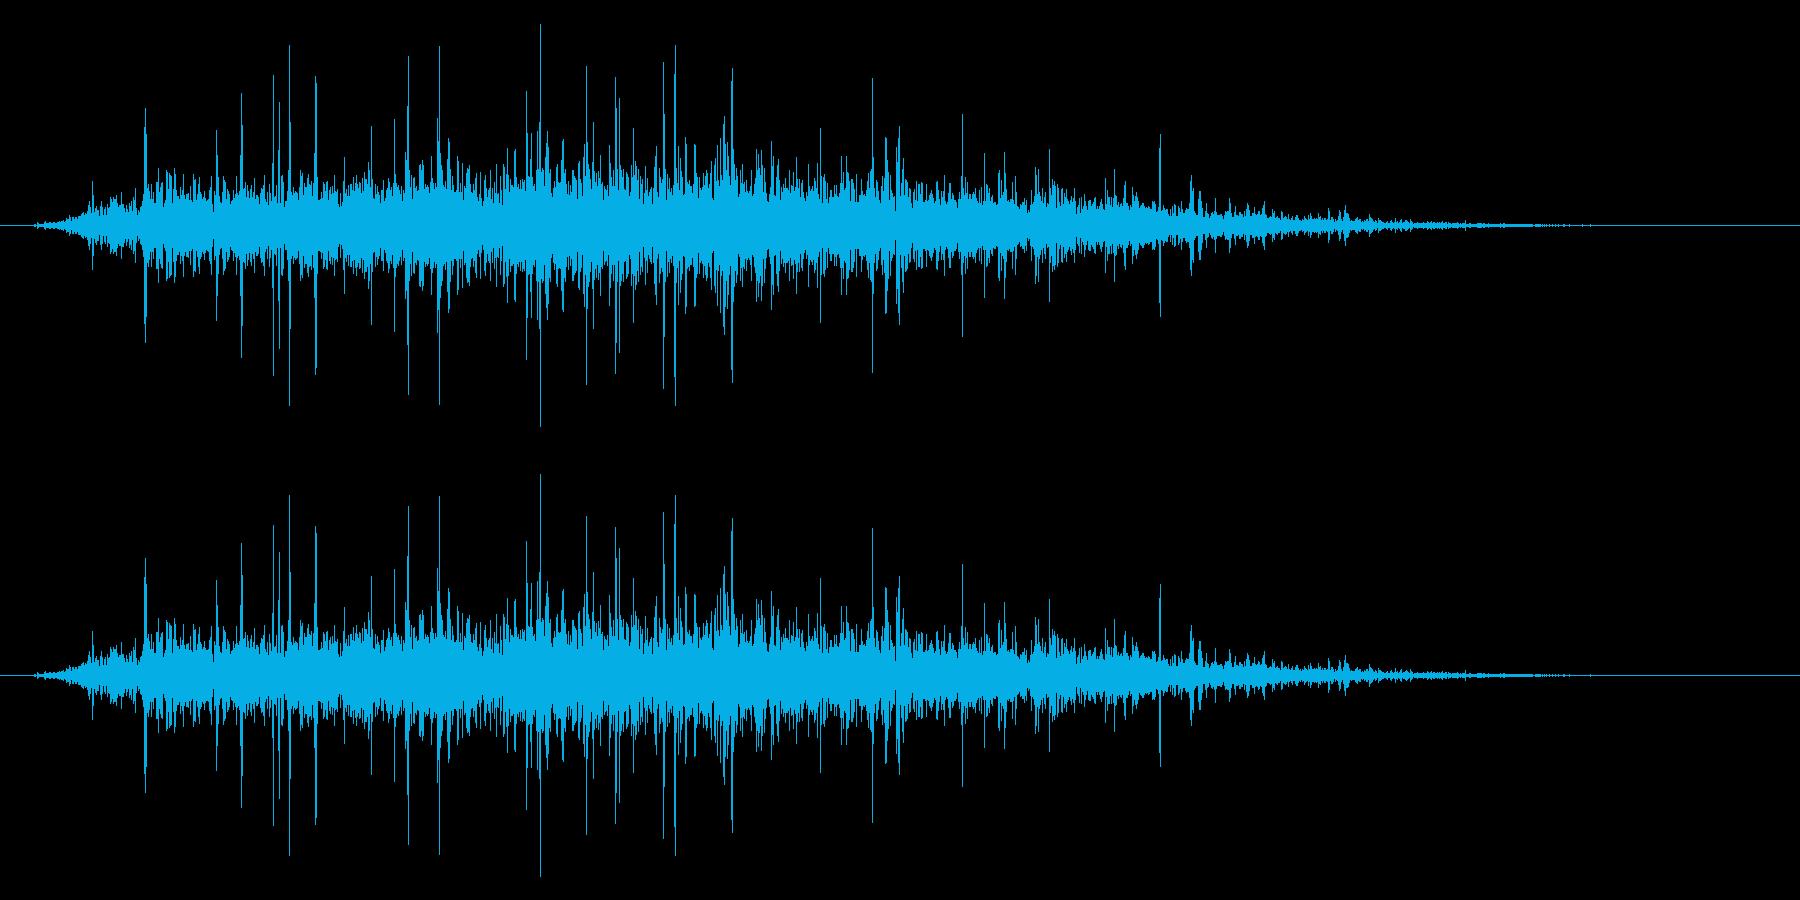 SNES ゴルフ01-09(歓声)の再生済みの波形